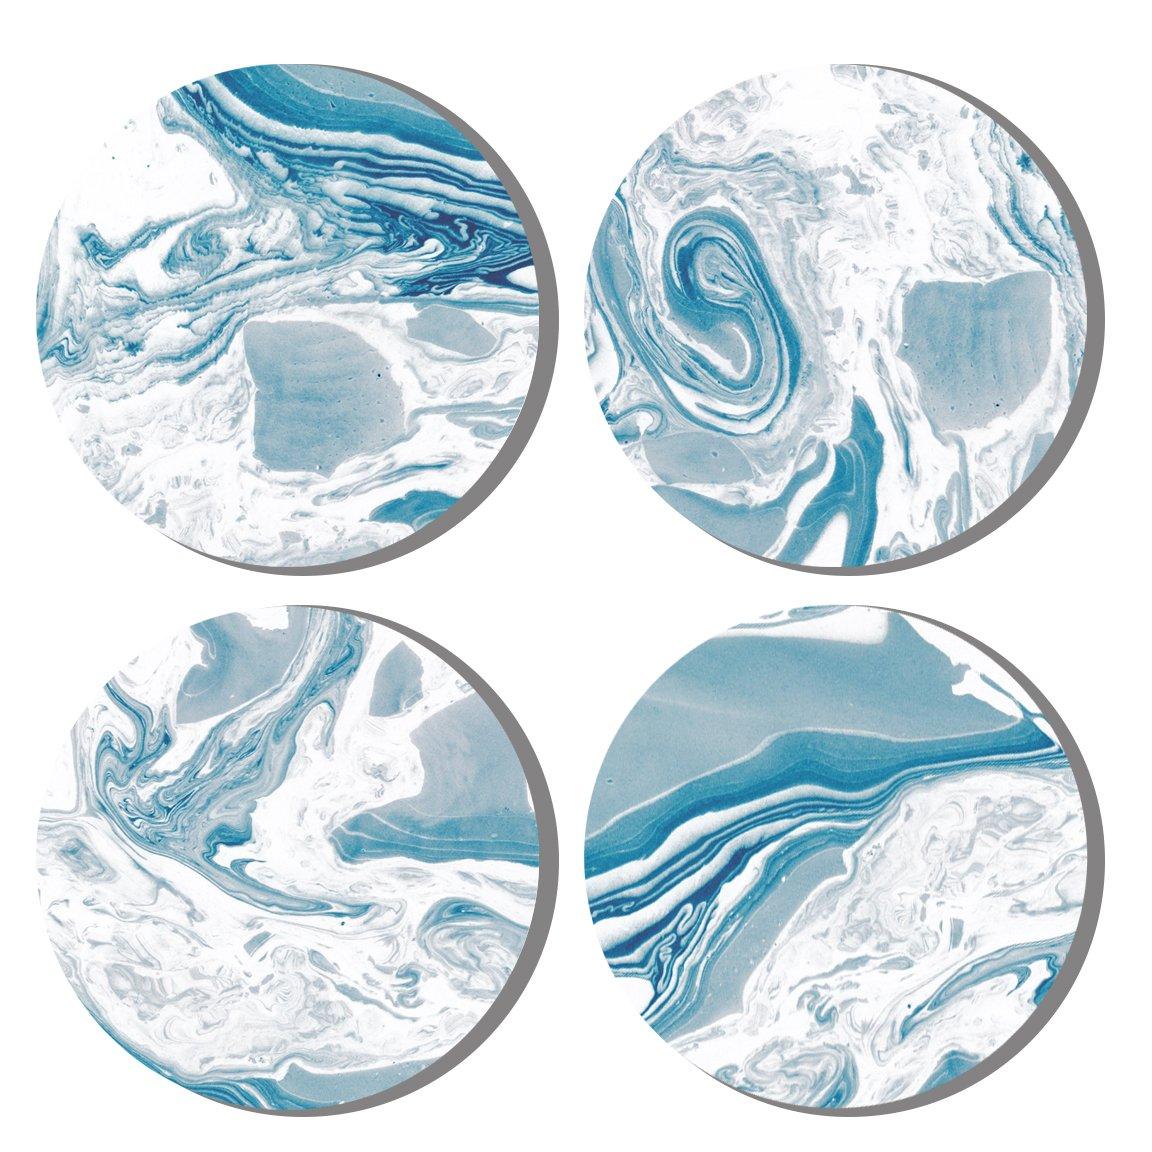 Dragonfruit Ceramic Coasters, 4 Pack, Marble Design, Cork Back, 4'' Diameter, 0.25'' Height - Blue